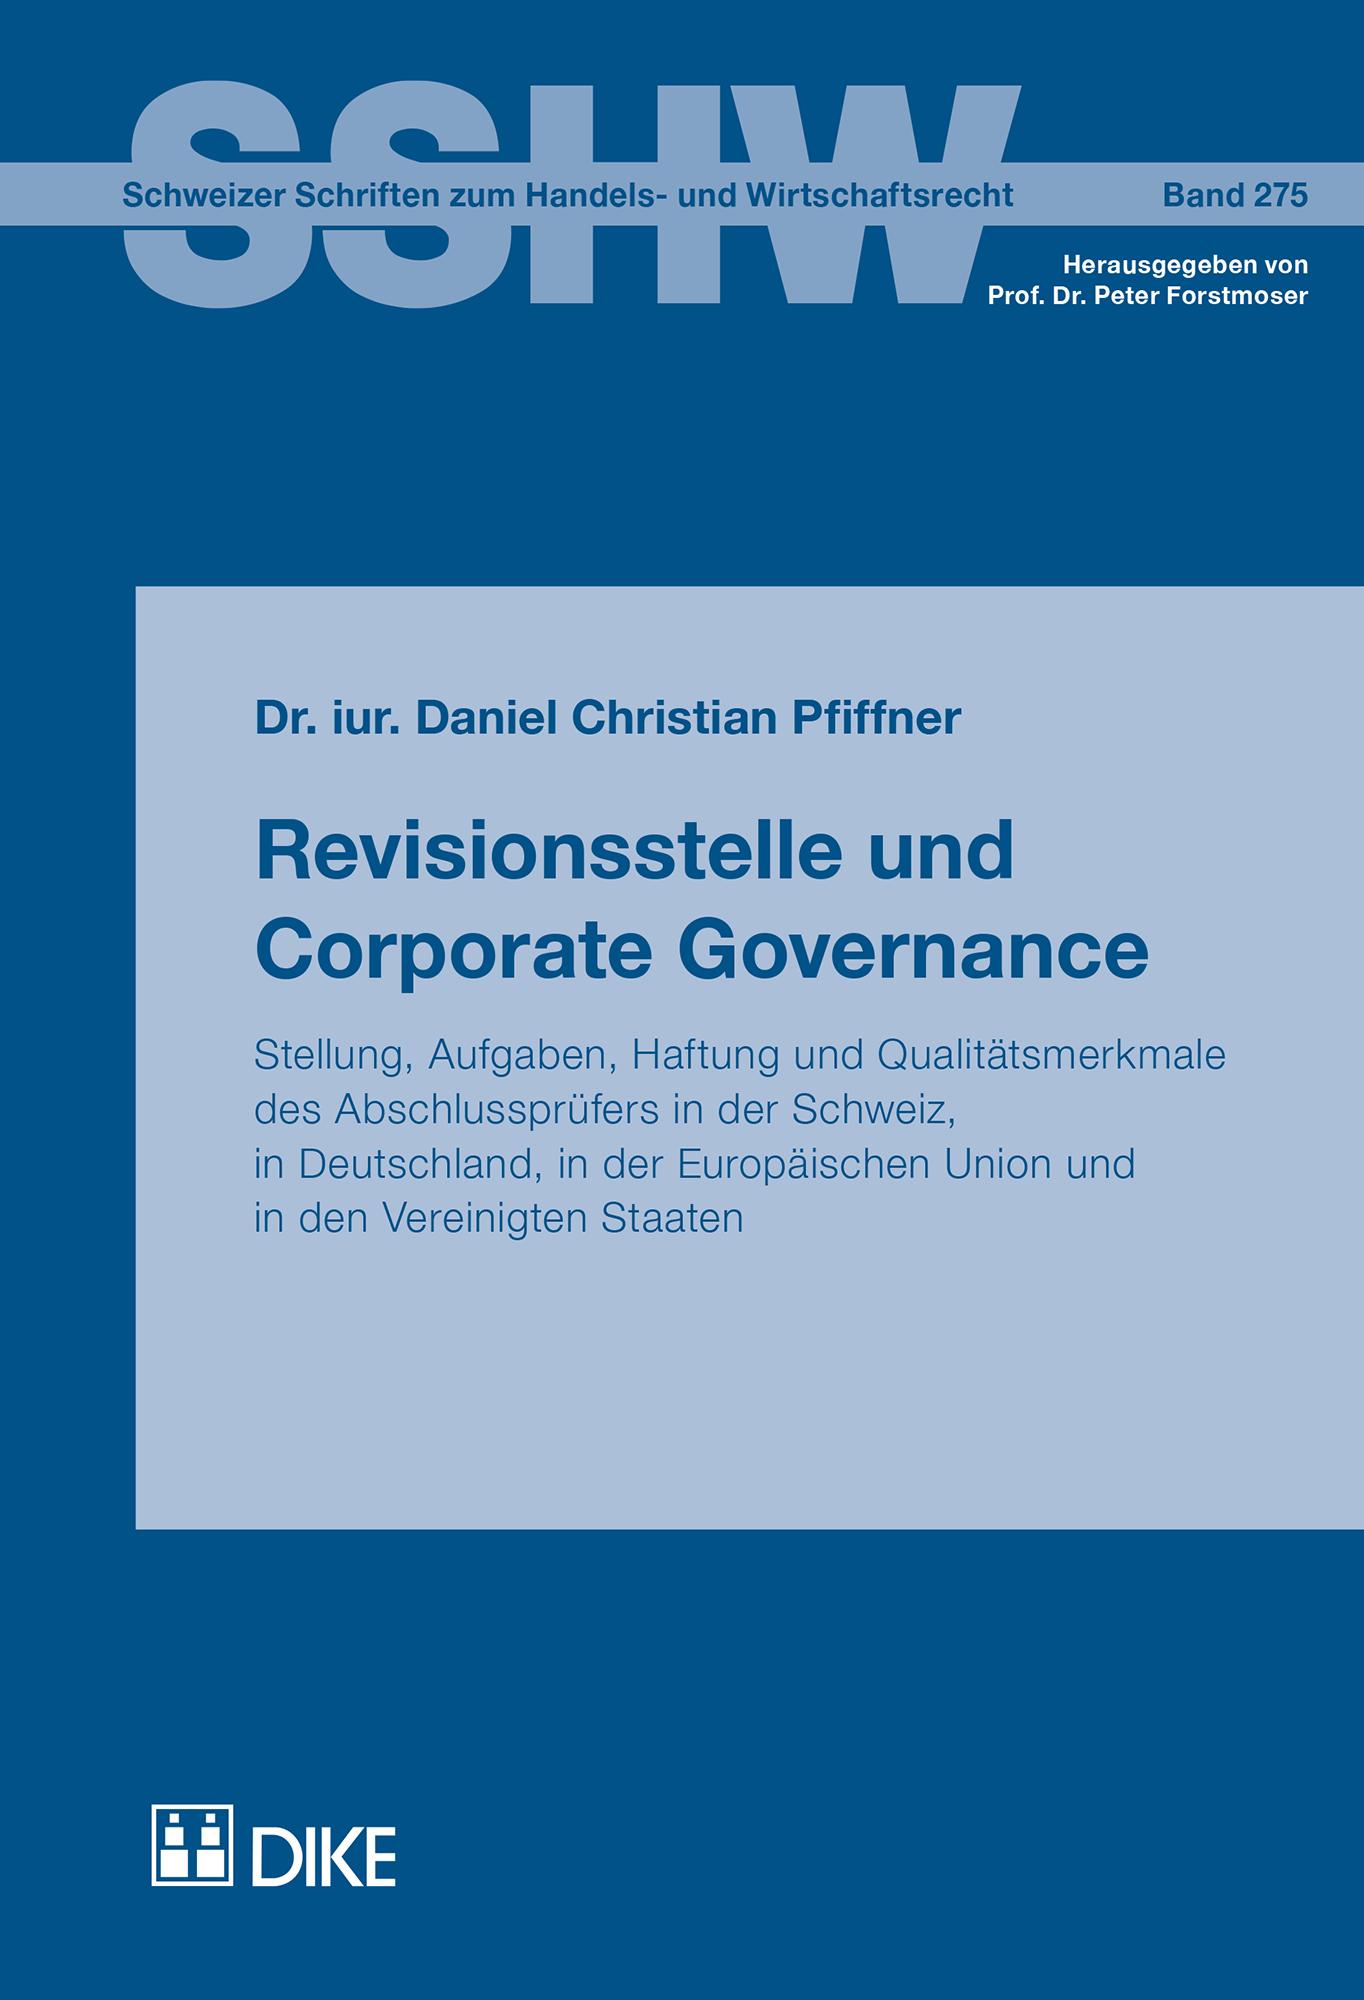 Revisionsstelle und Corporate Governance